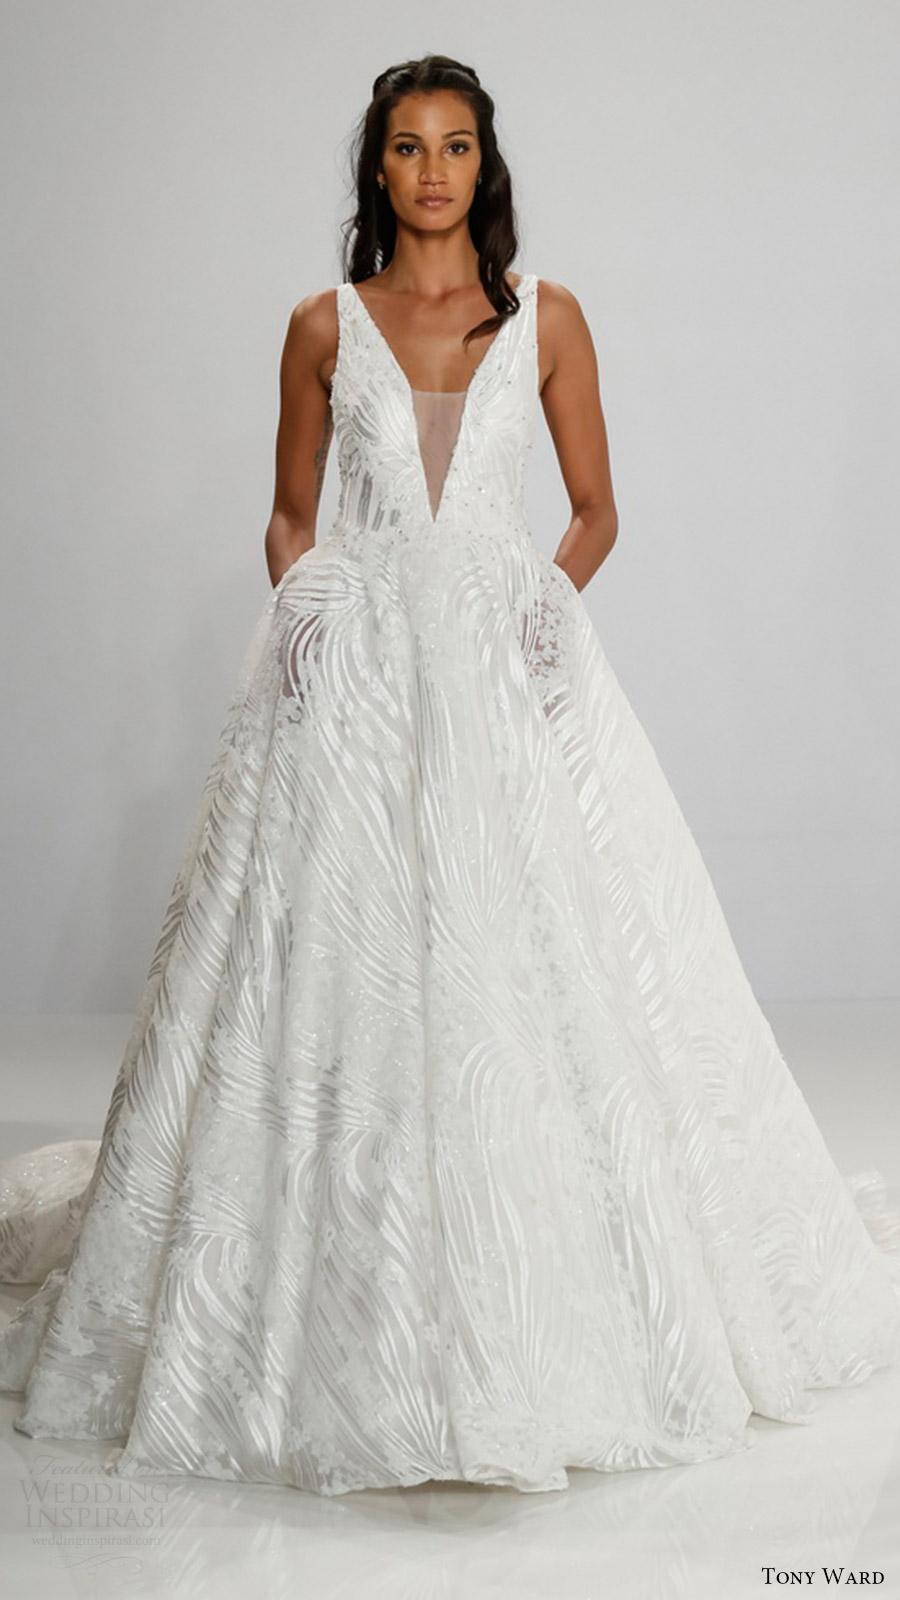 Tony ward bridal 2017 wedding dresses wedding inspirasi for Best wedding dresses 2017